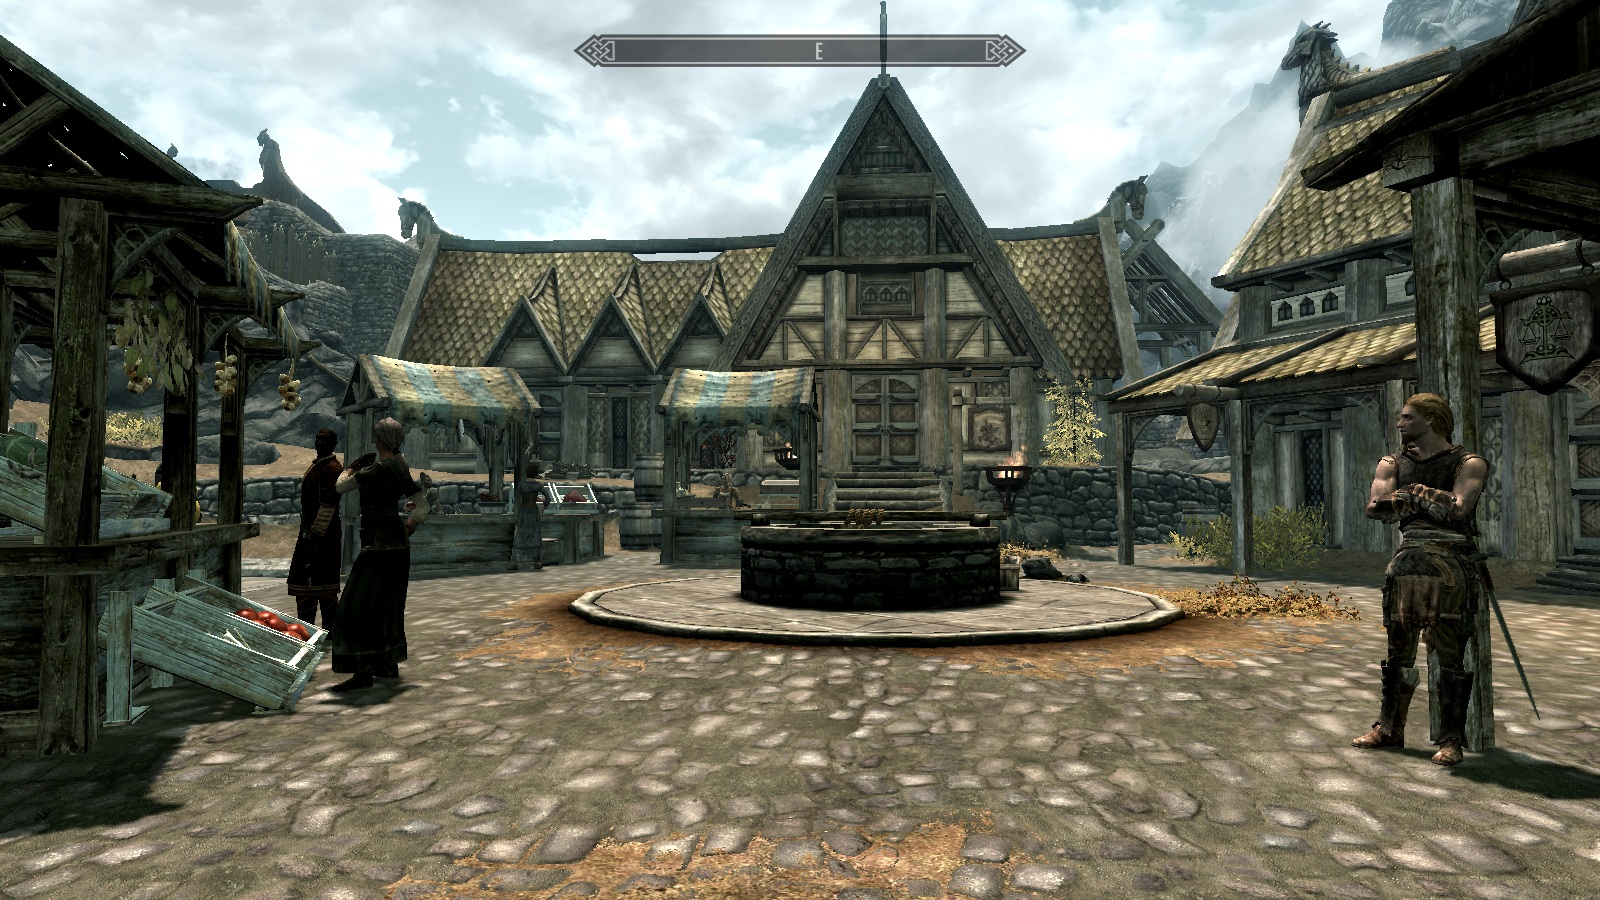 Imagen de la plaza de Carrera Blanca (Whiterun) de Skyrim